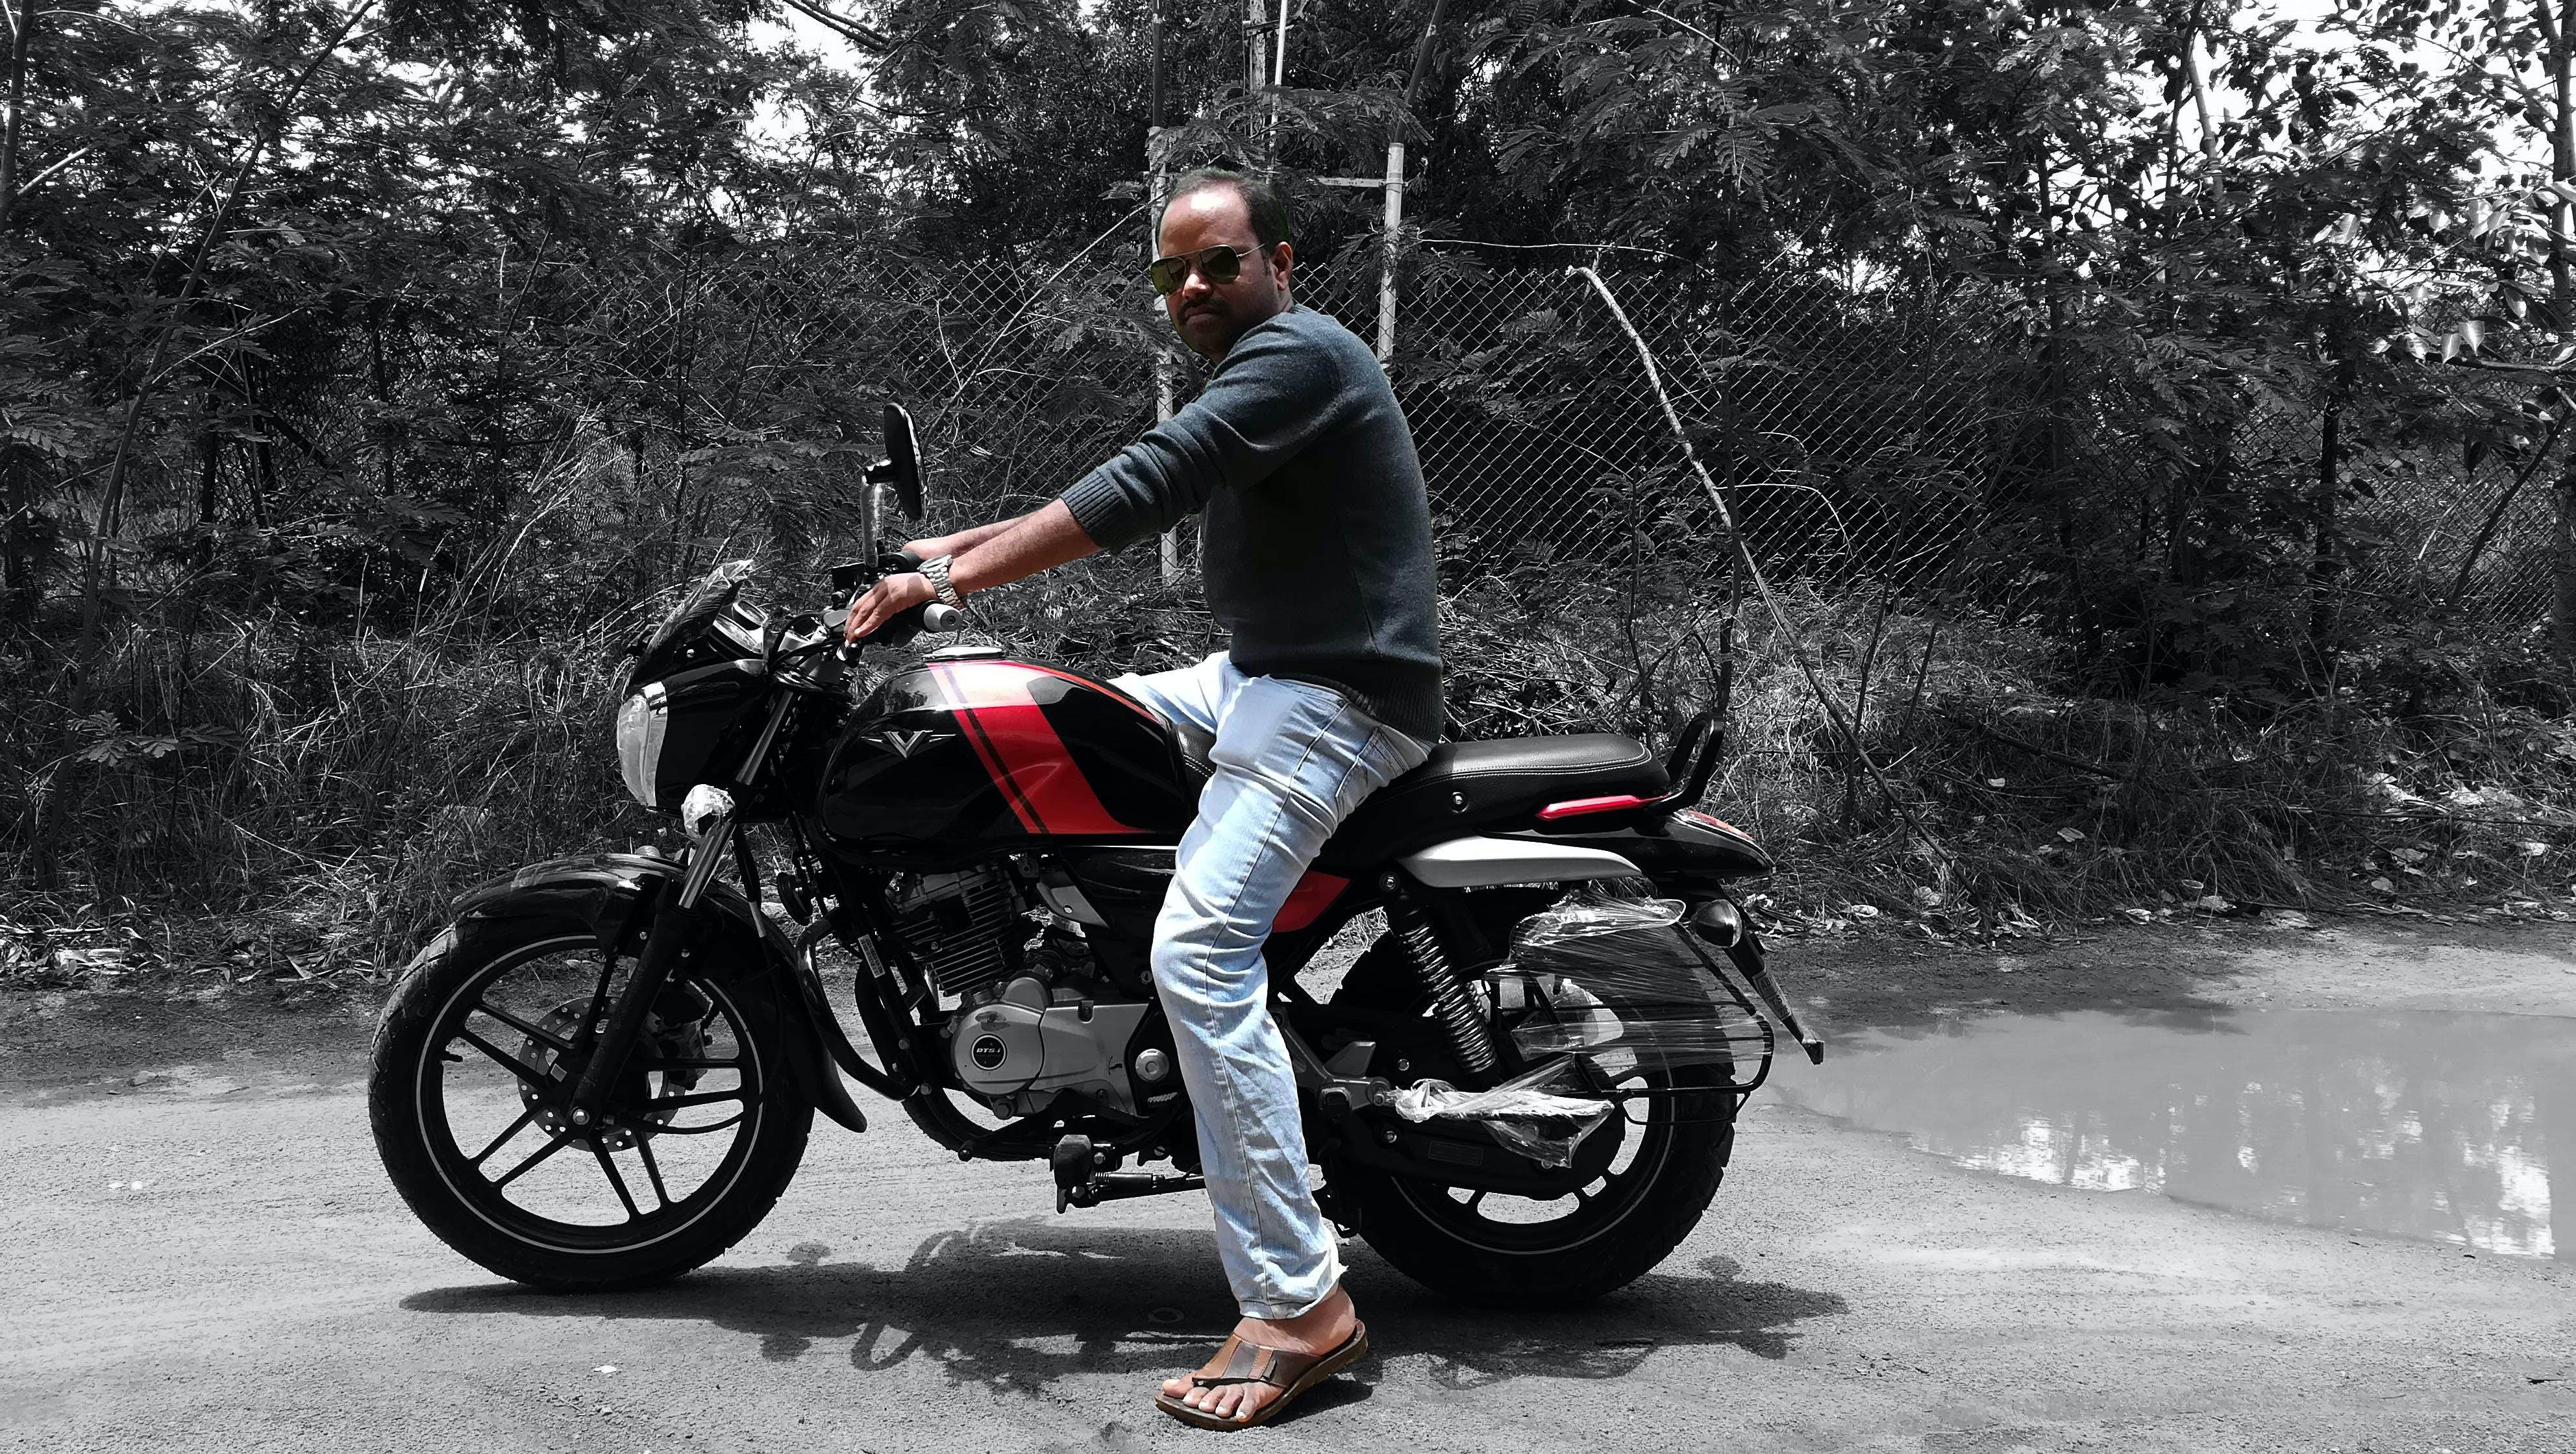 Free stock photo of Vikranth 15